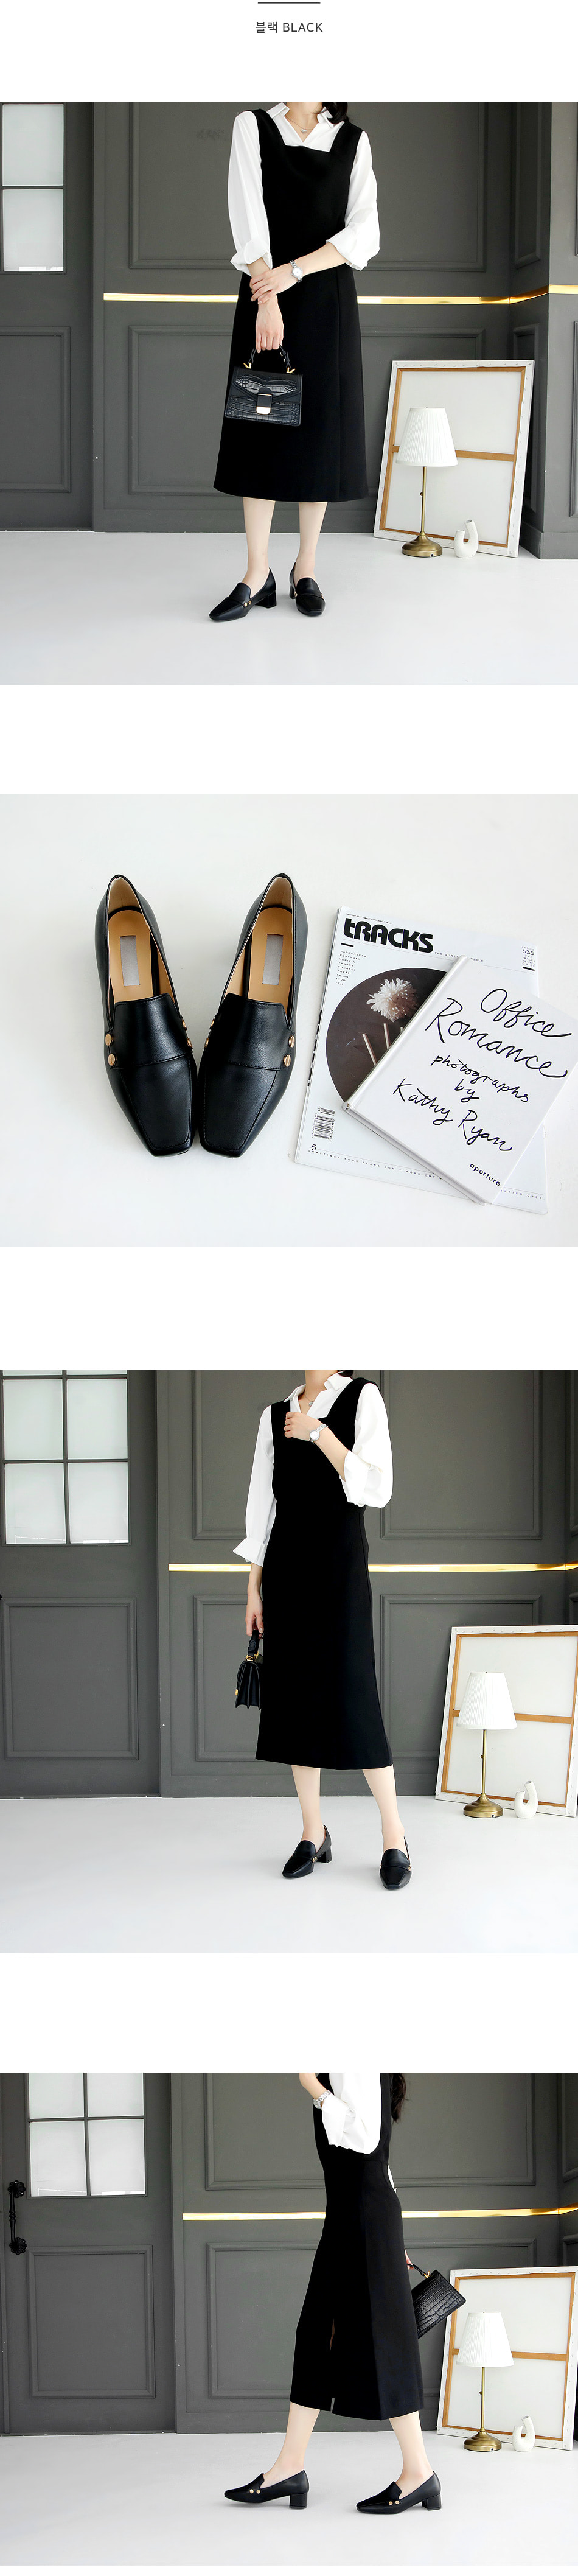 Ivez loafers 4cm